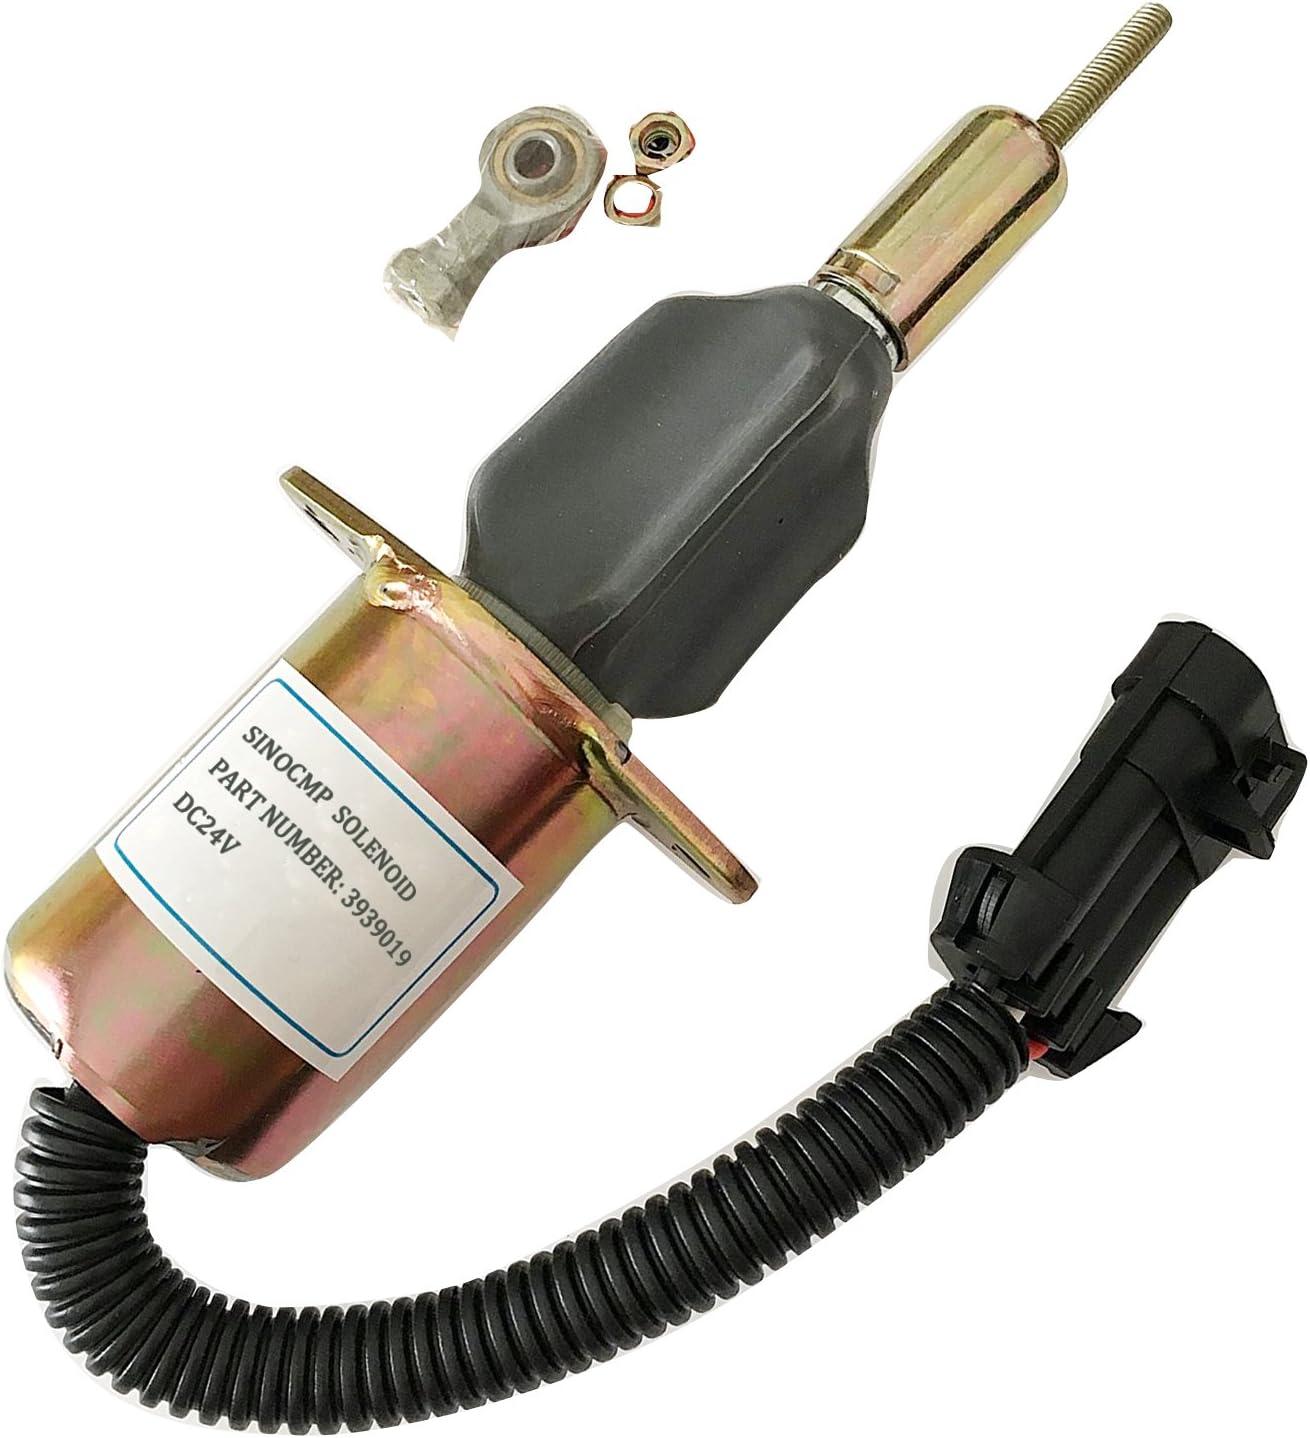 SINOCMP Flameout Solenoid Switch 3991201 for Cummins 8.1 excavator